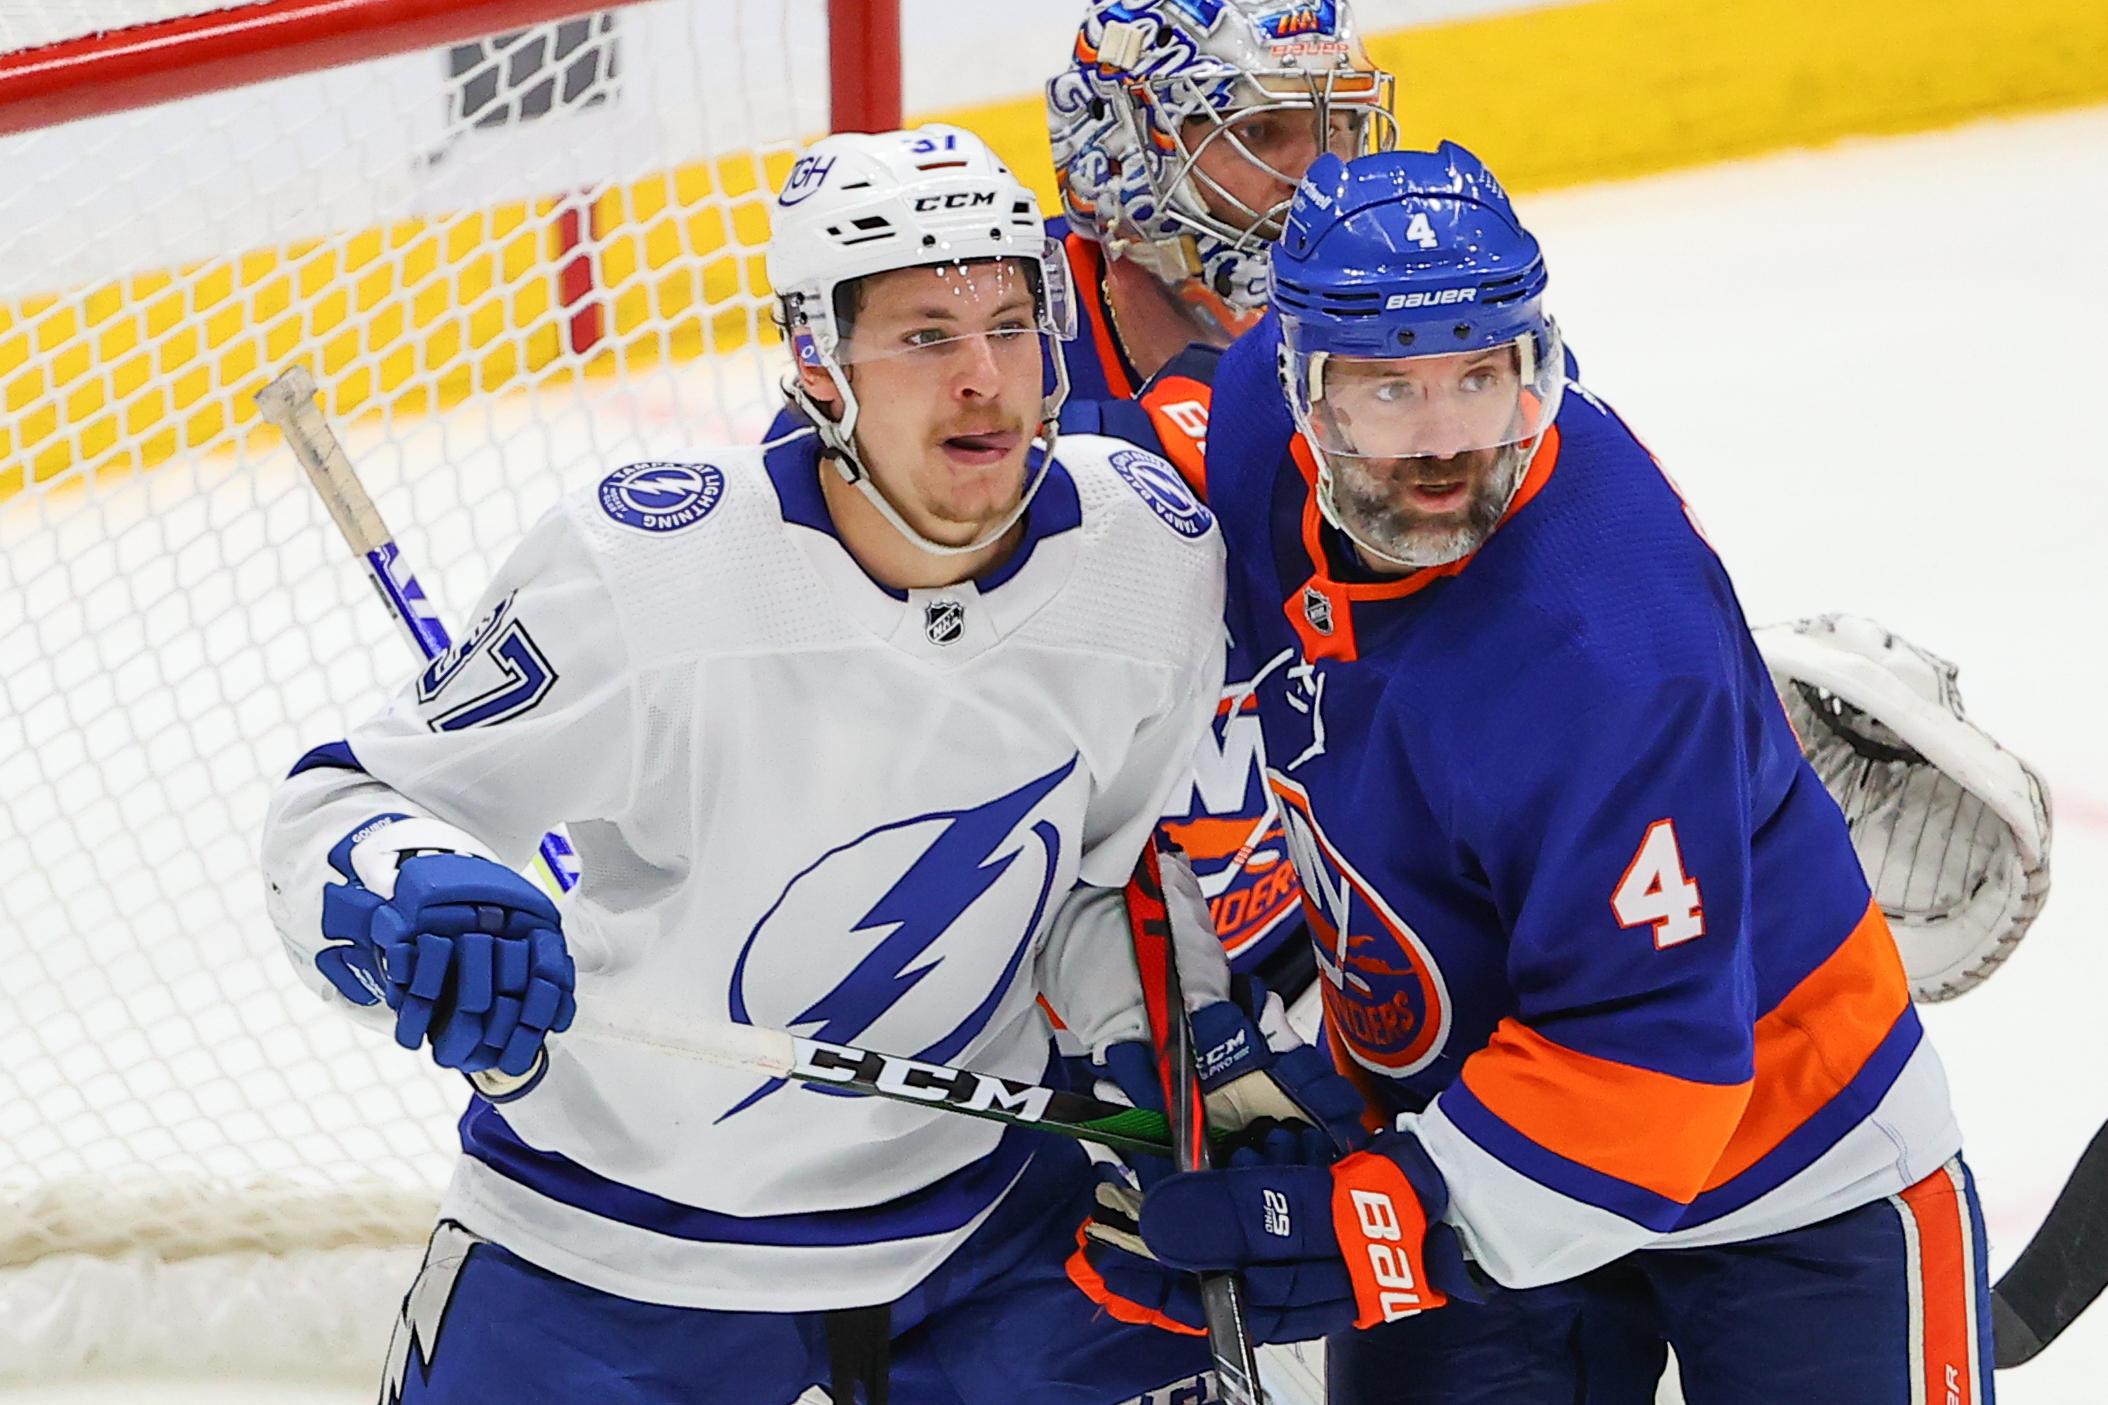 NHL: JUN 17 Stanley Cup Playoffs Semifinals - Lightning at Islanders